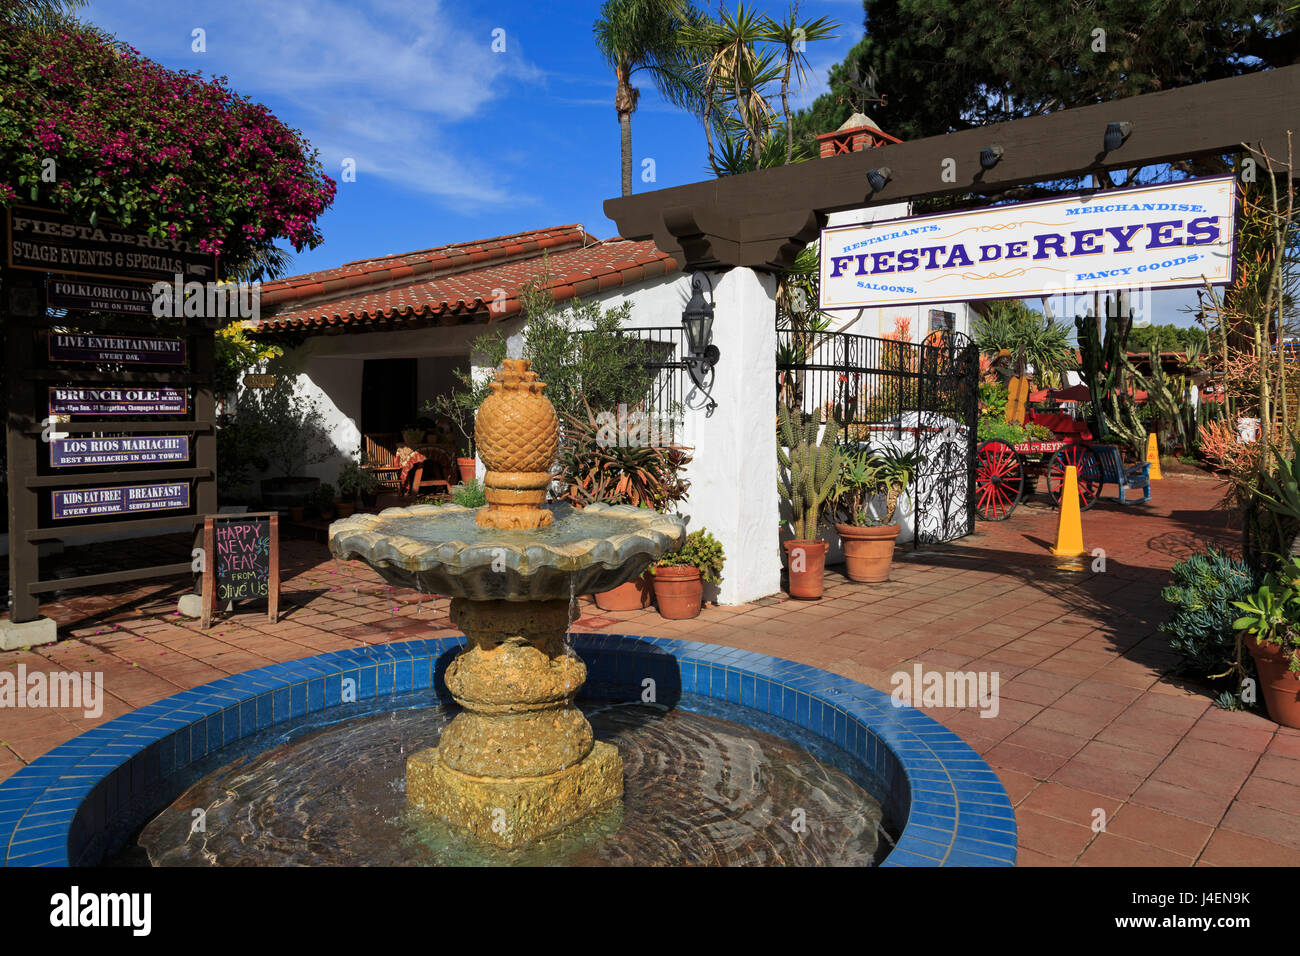 Fiesta de Reyes, Old Town Sate parco storico, San Diego, California, Stati Uniti d'America, America del Nord Immagini Stock